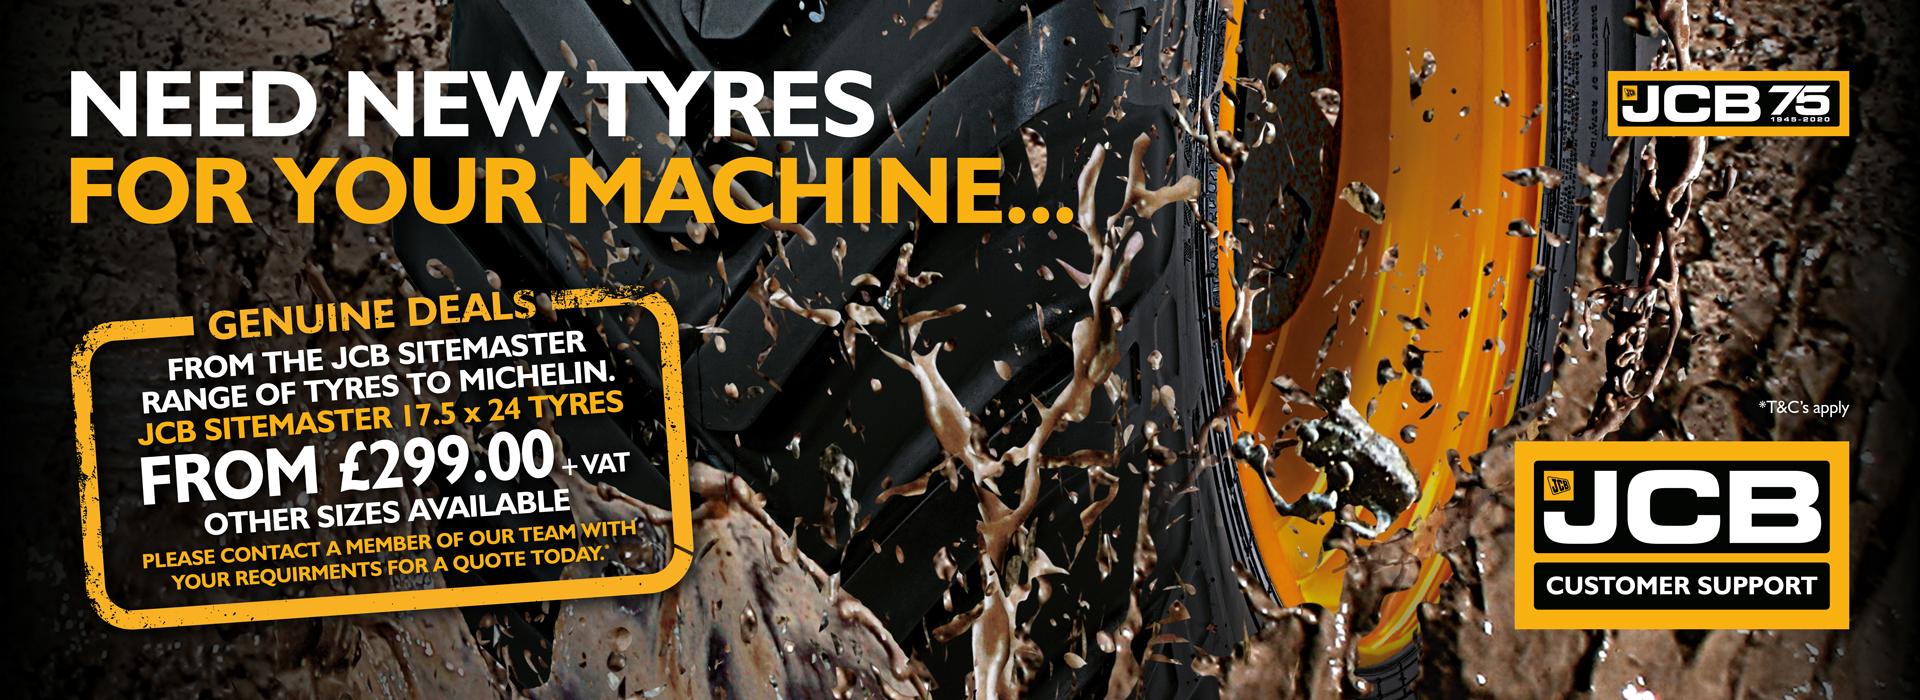 JCB tractor tyres from £3299+VAT at John Bownes Ltd